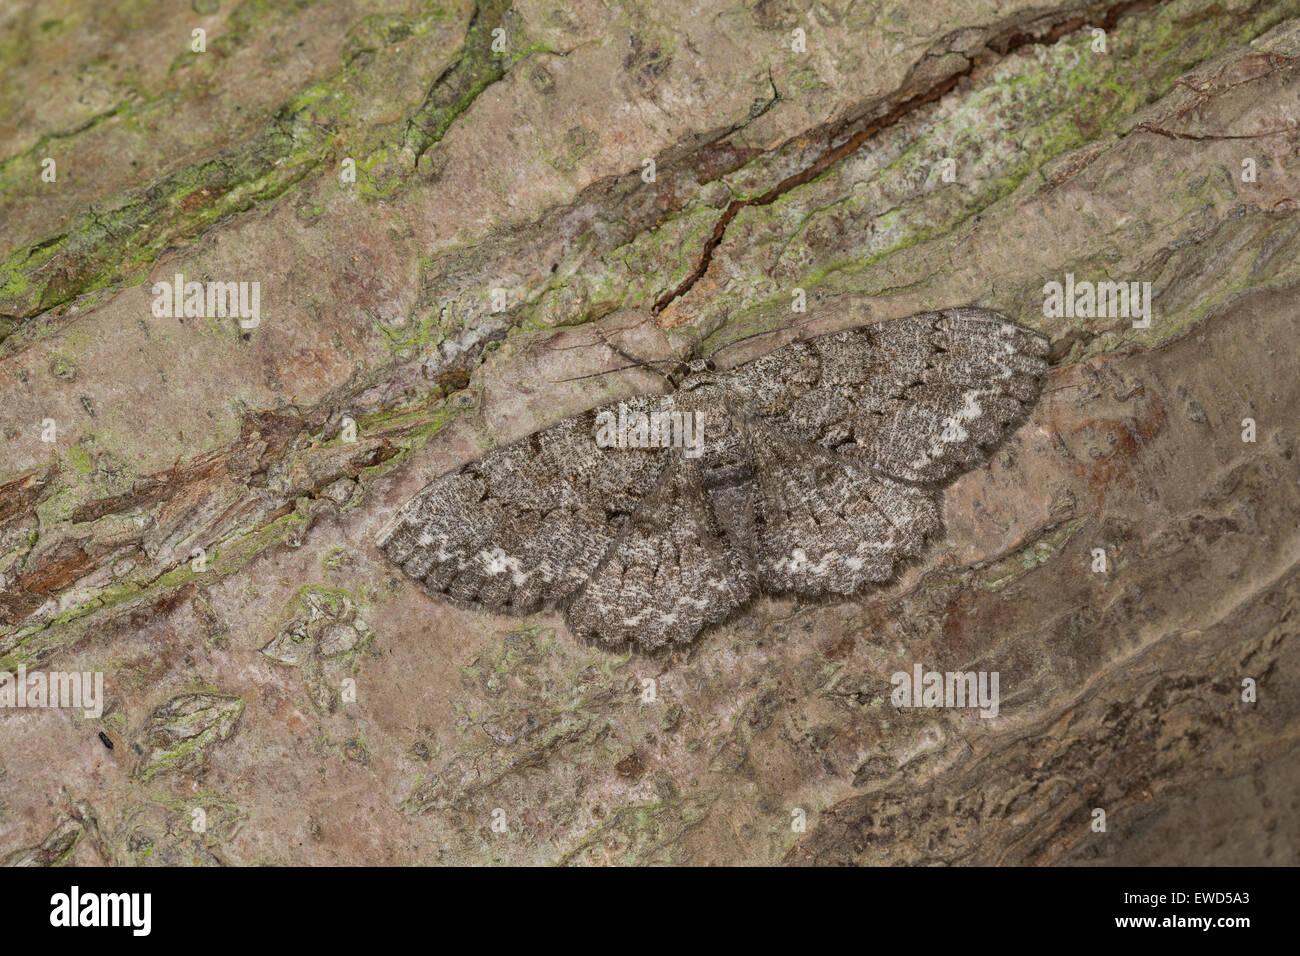 Pale Oak Beauty, Aschgrauer Baumspanner, Rindenspanner, Hypomecis punctinalis, Boarmia punctinalis, Boarmia consortaria - Stock Image